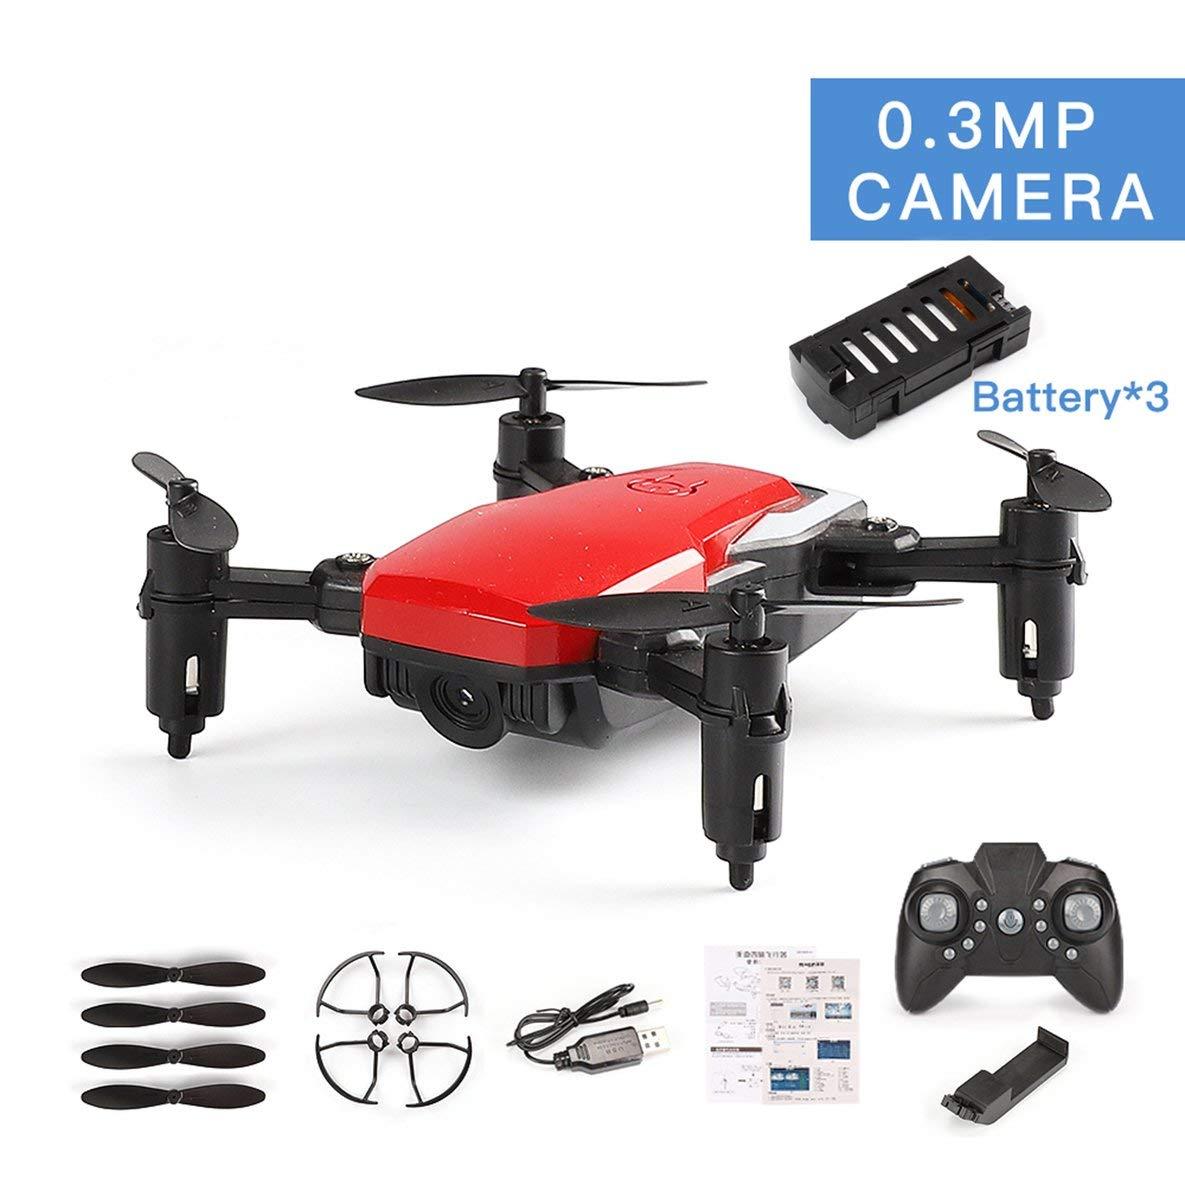 Moliies LF606 3 baterías Drone con 0.3MP Cámara FPV Quadcopter Drones Plegables RC